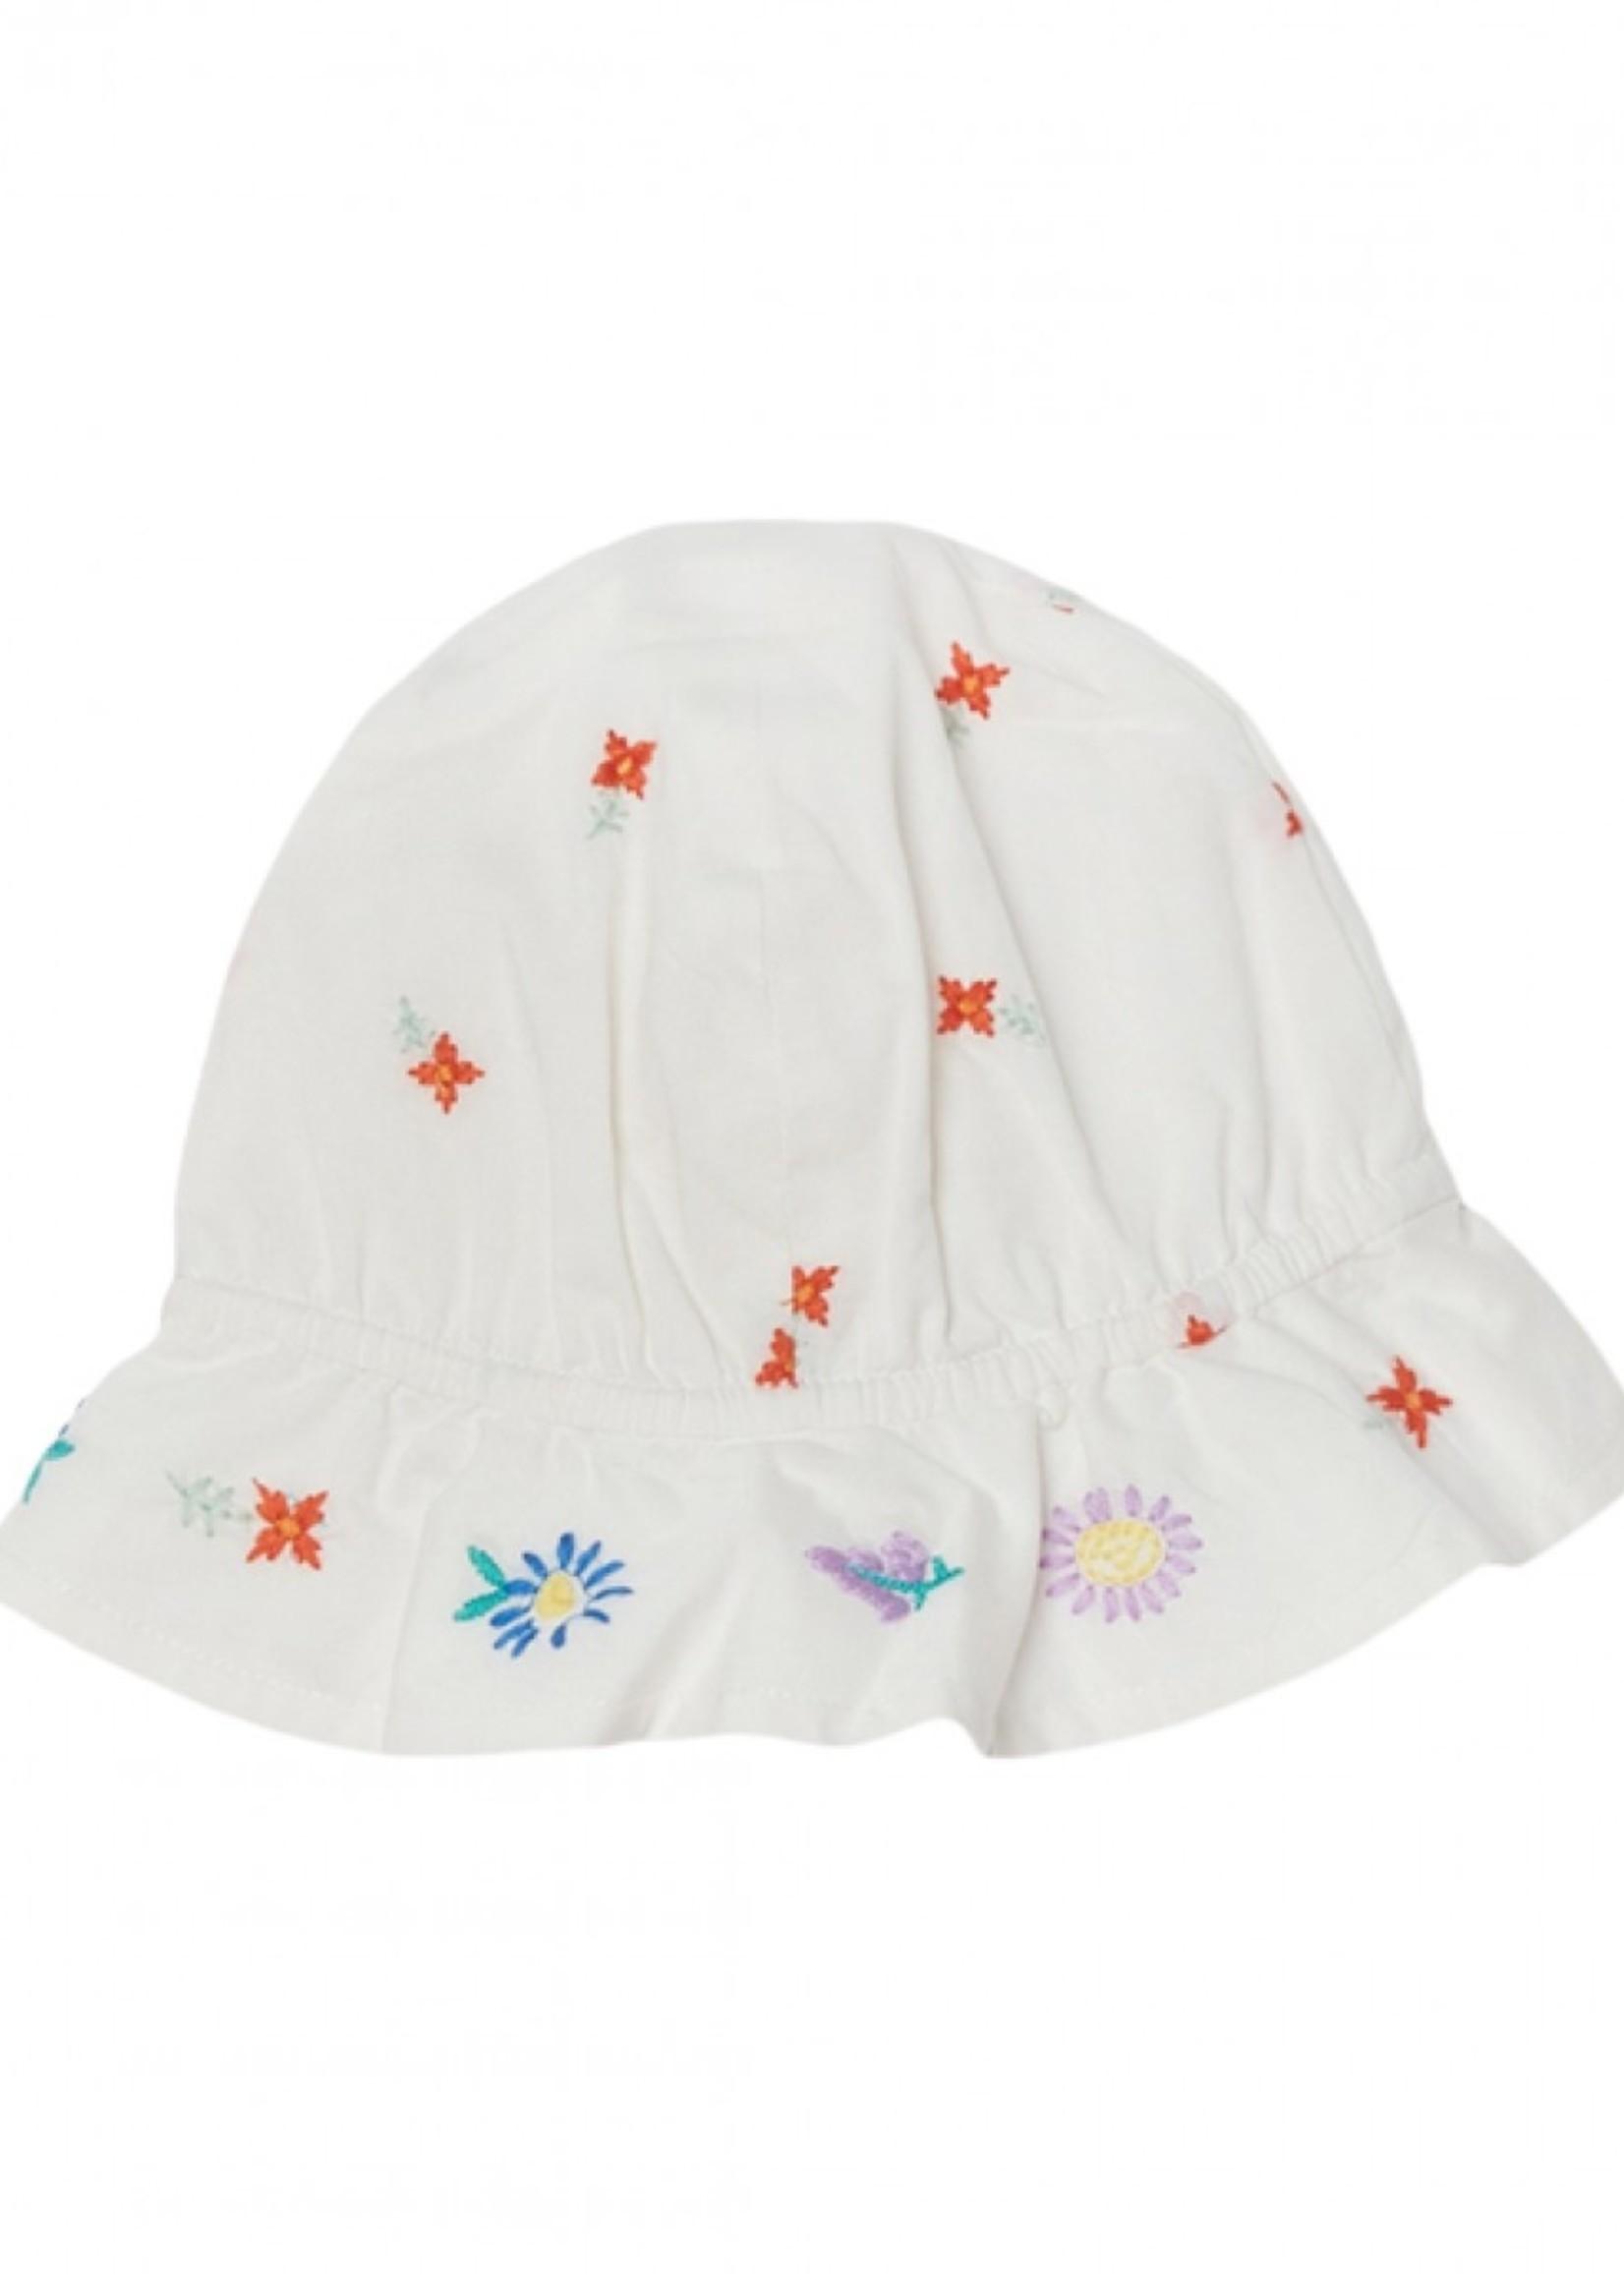 Stella McCartney Stella Mccartney-SS21 602558 Embroidered Flowers Cotton Hat